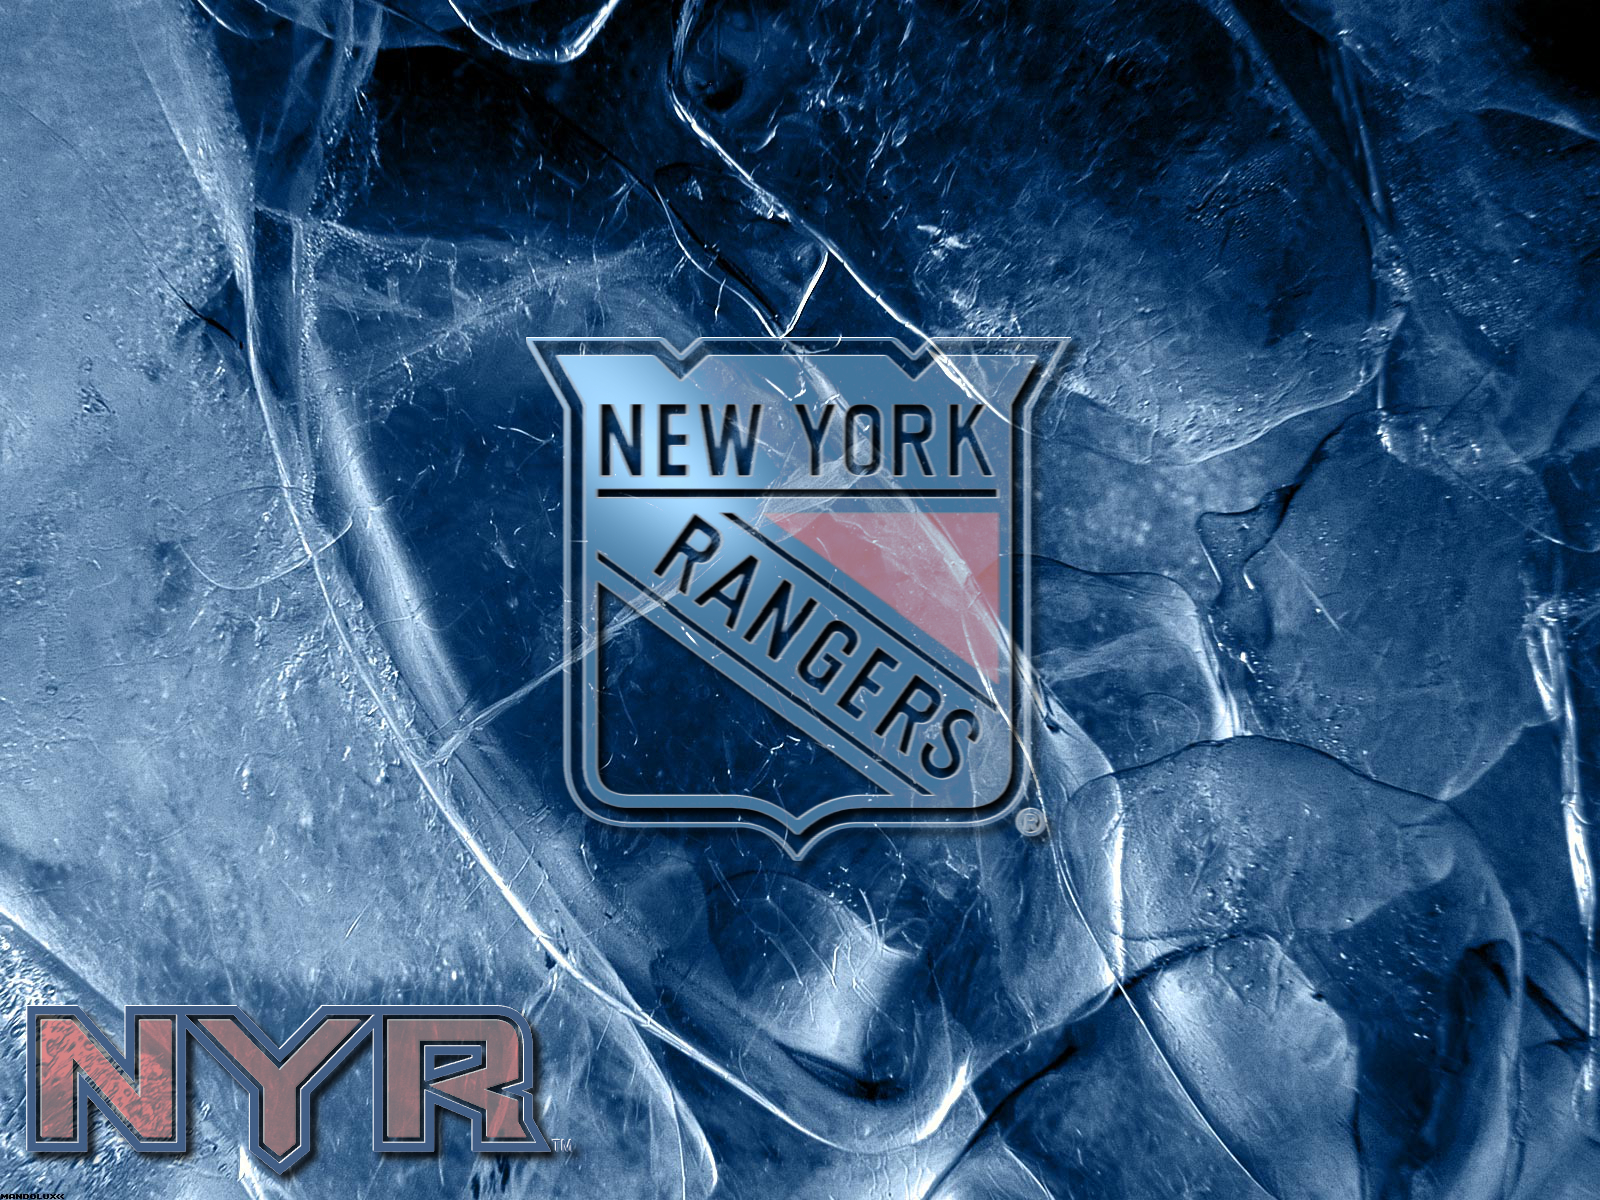 Nhl new york rangers by realyze on deviantart nhl new york rangers by realyze nhl new york rangers by realyze sciox Choice Image